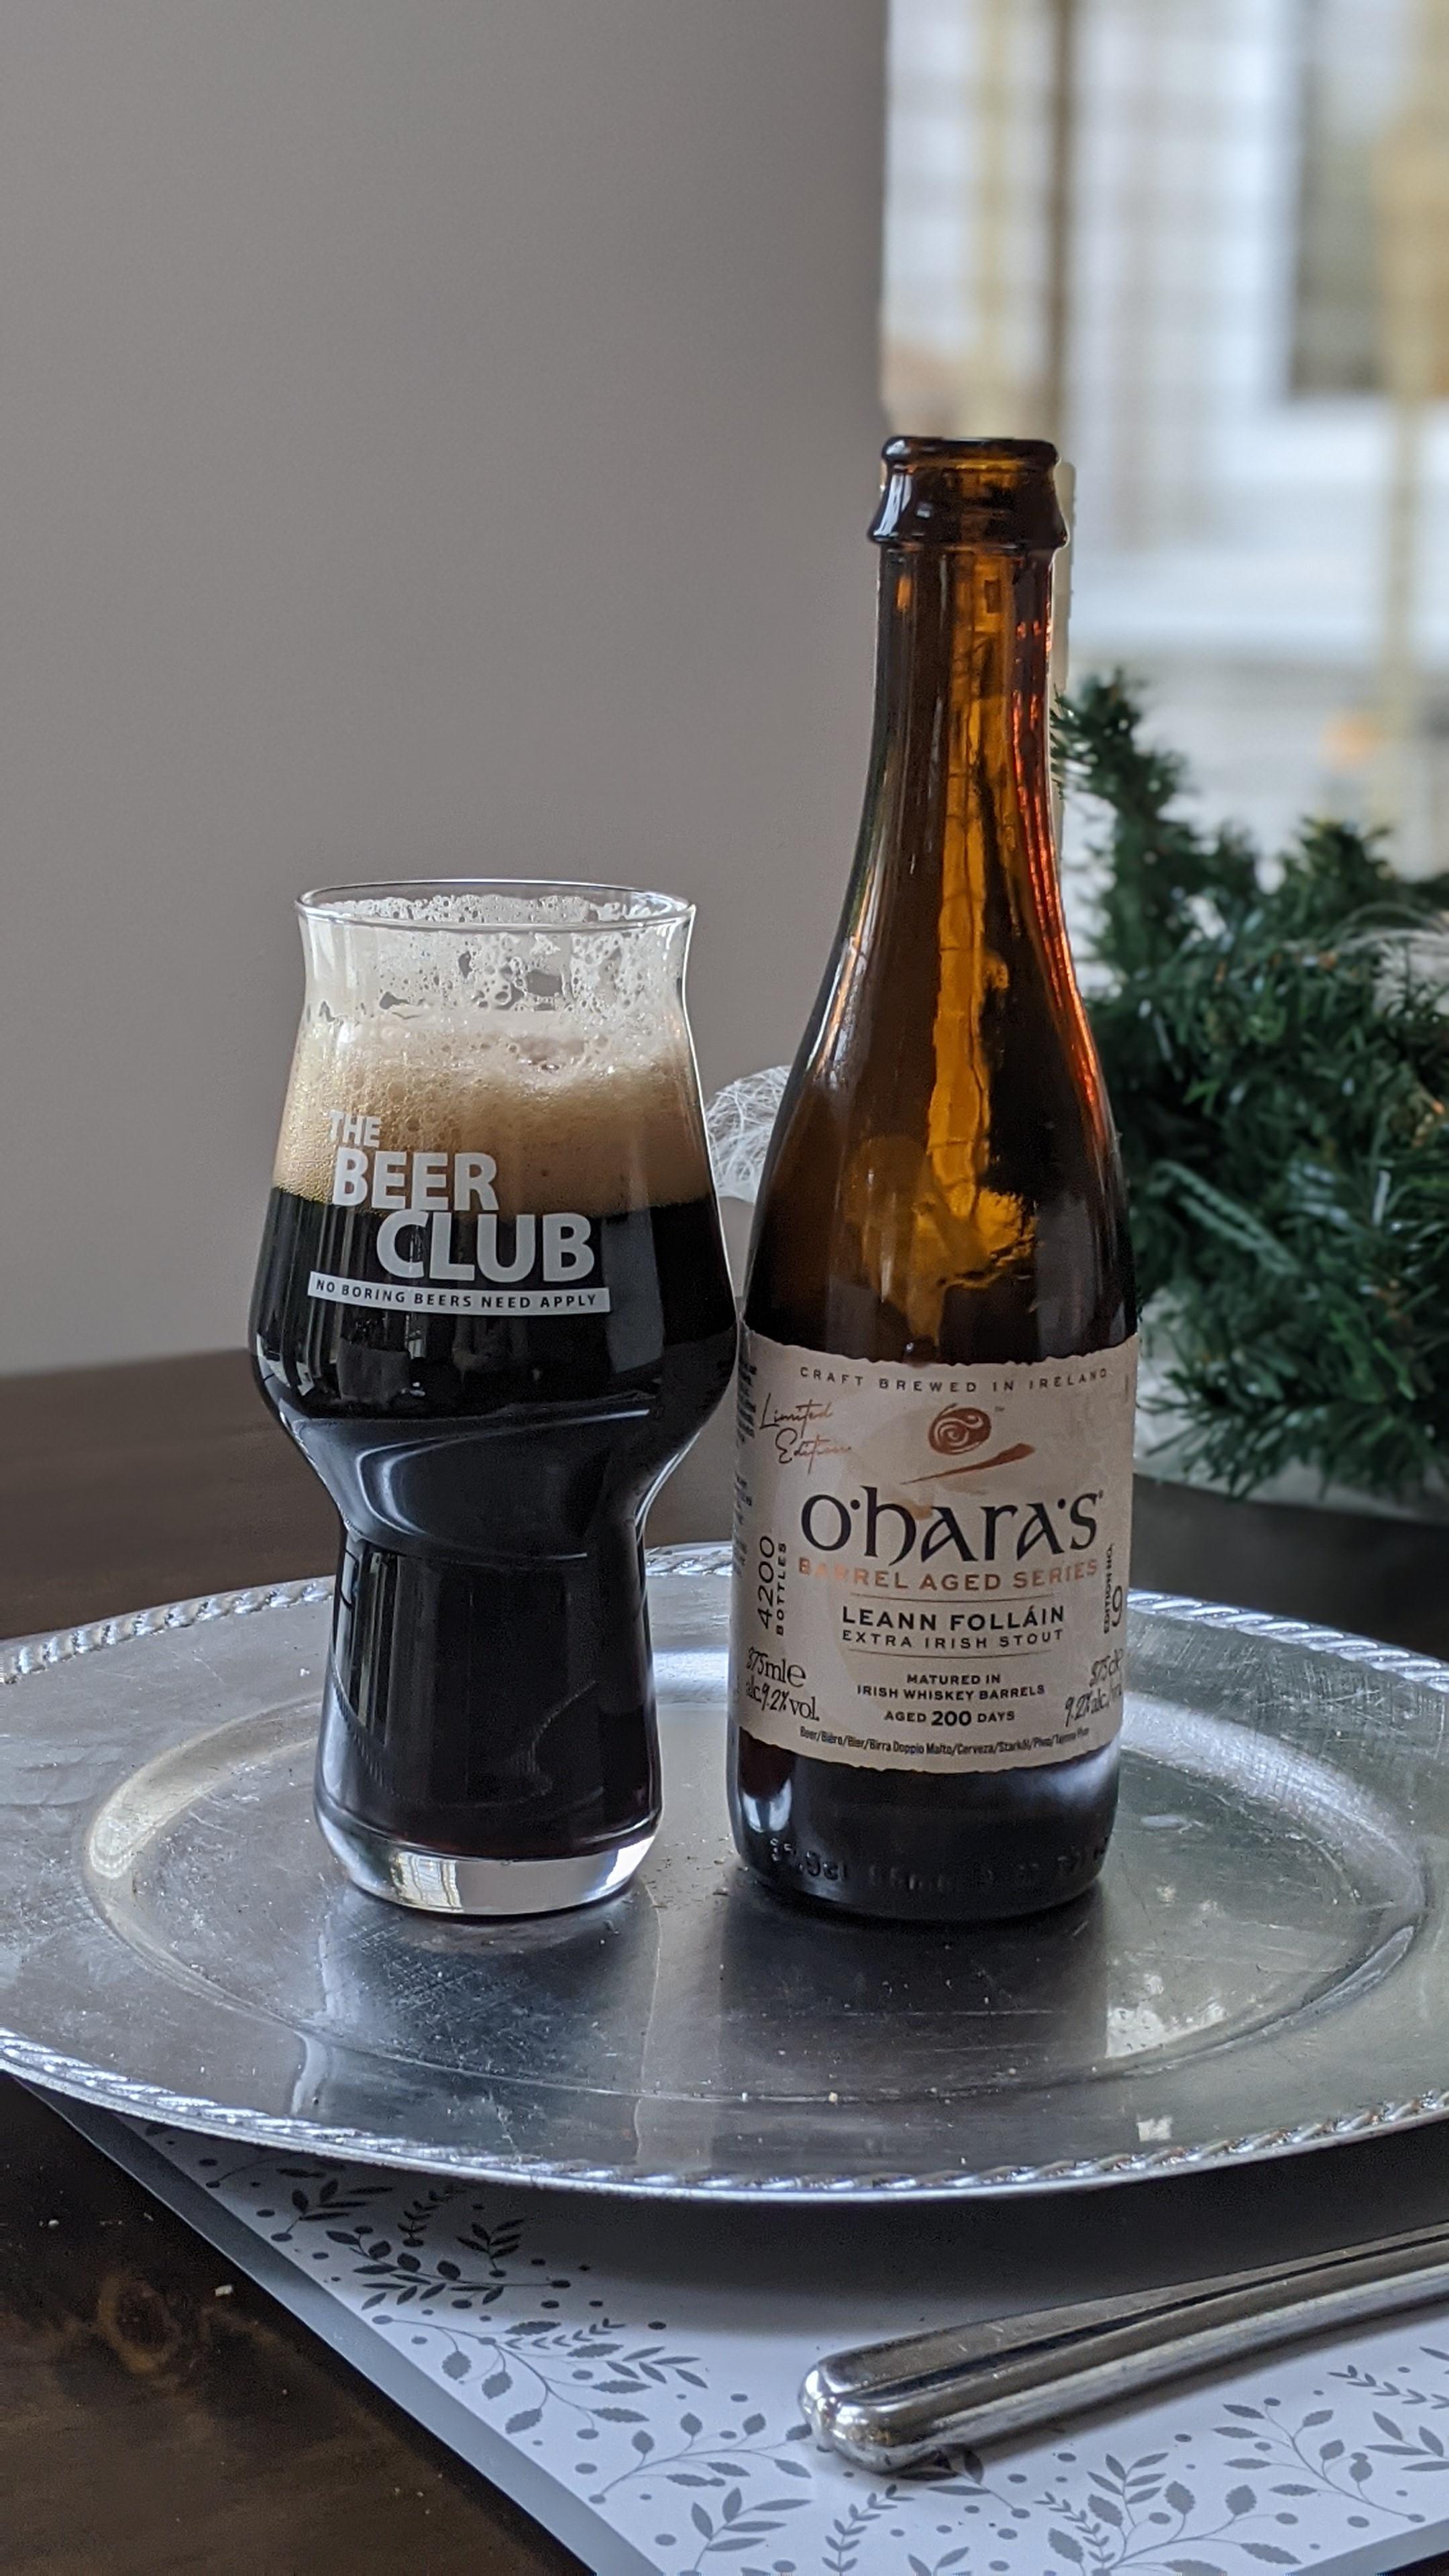 dark stout with good white head, bottle beside it